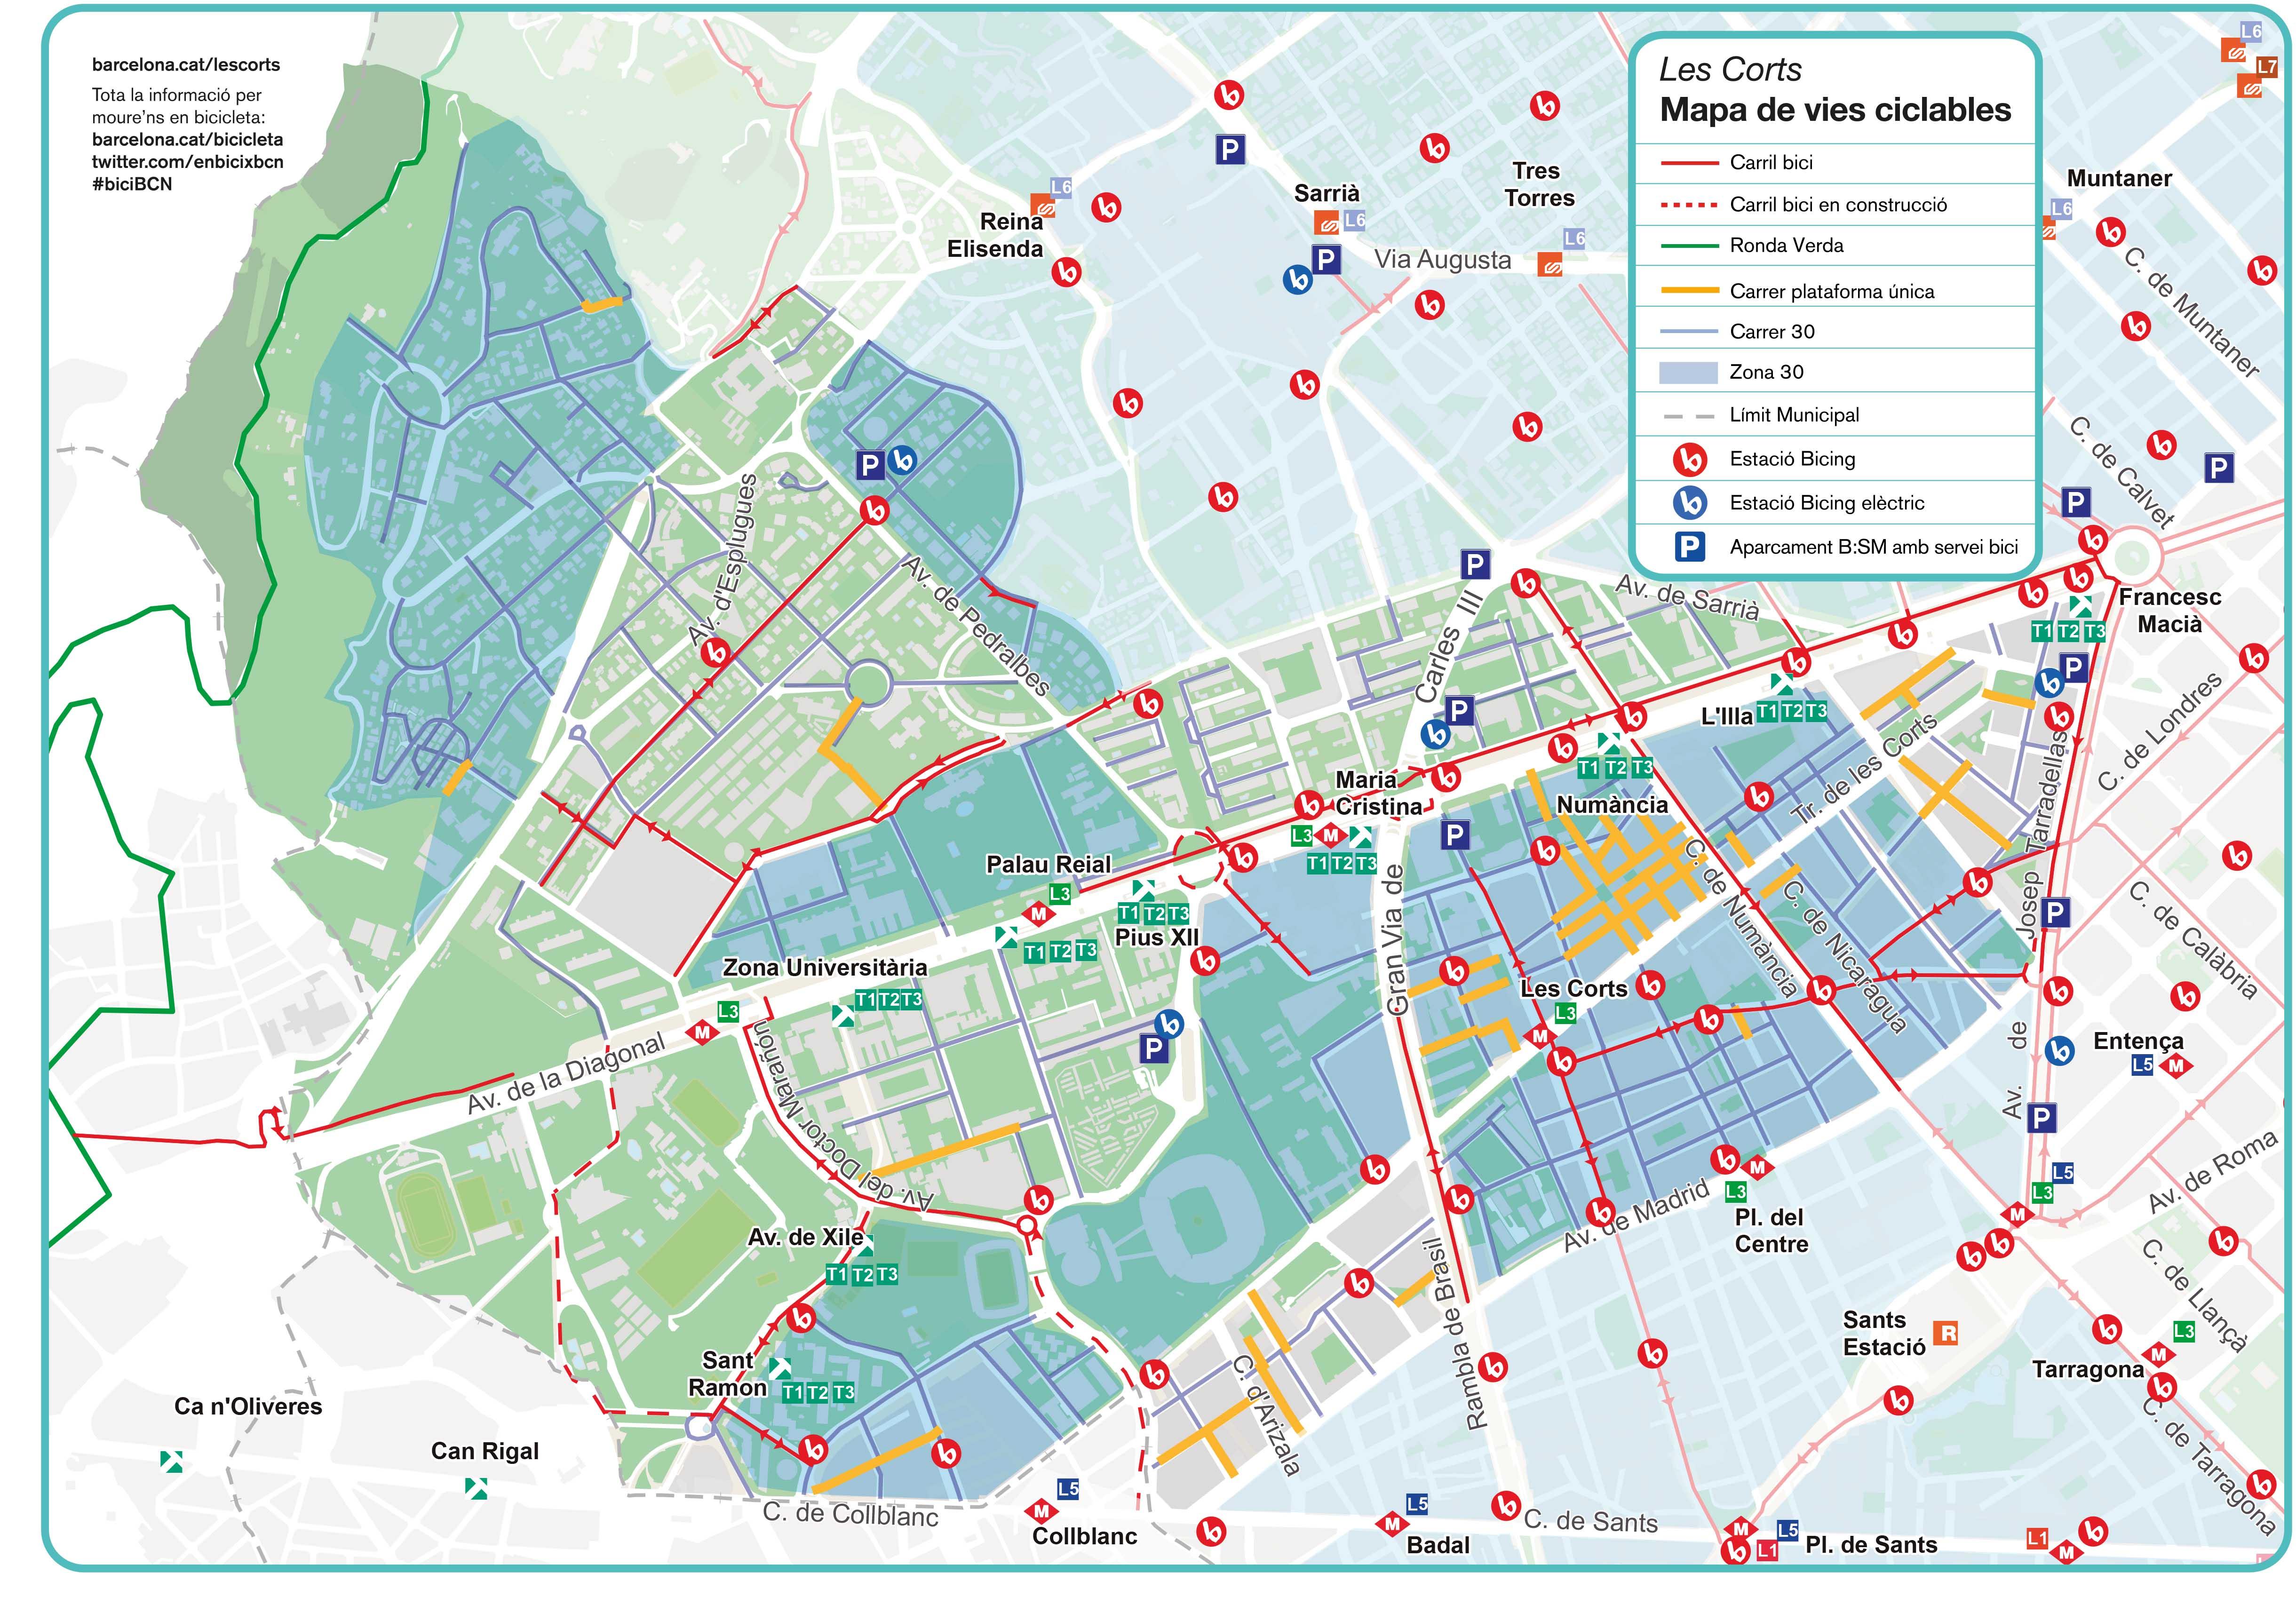 Actualizado El Mapa De Vias Ciclables De Les Corts Les Corts